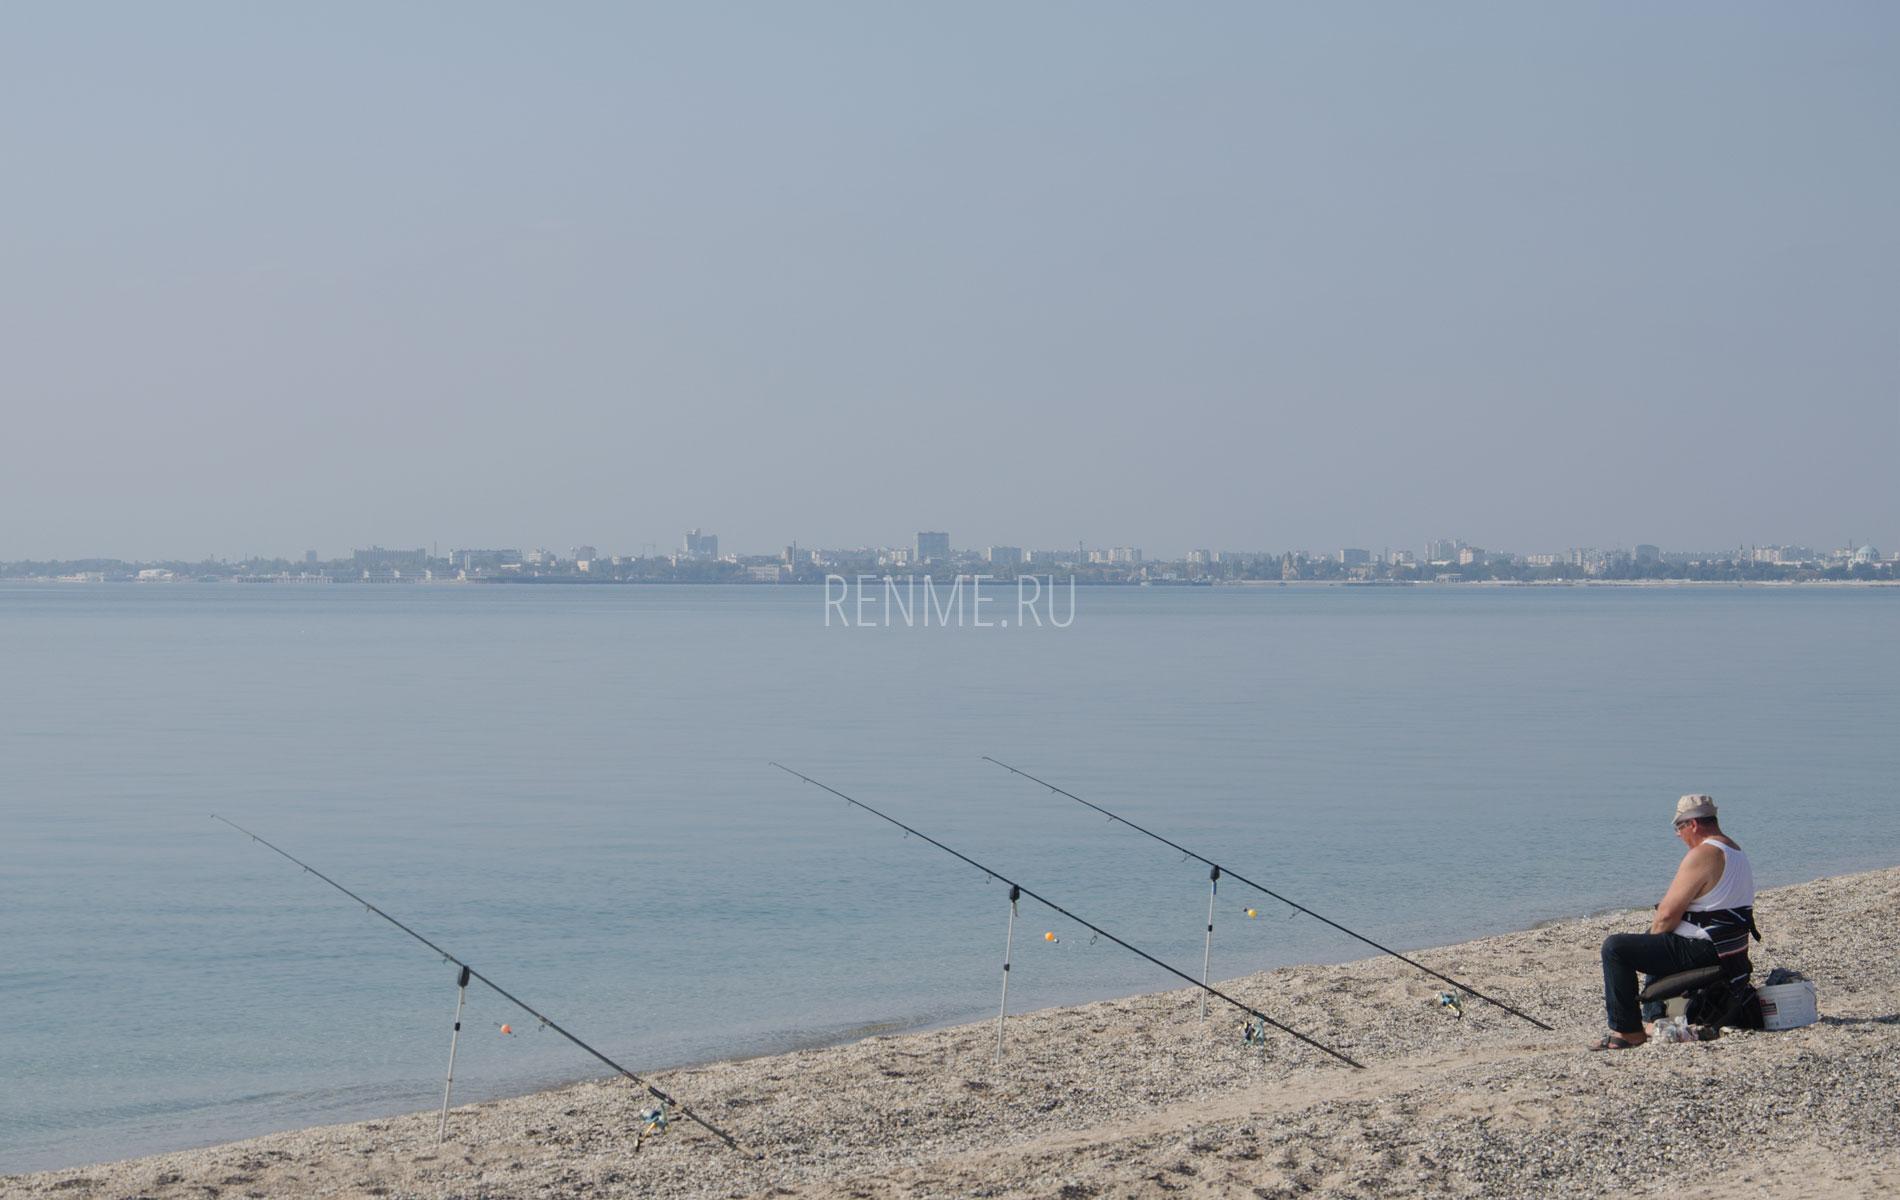 Рыбак на пляже в октябре. Фото Евпатории